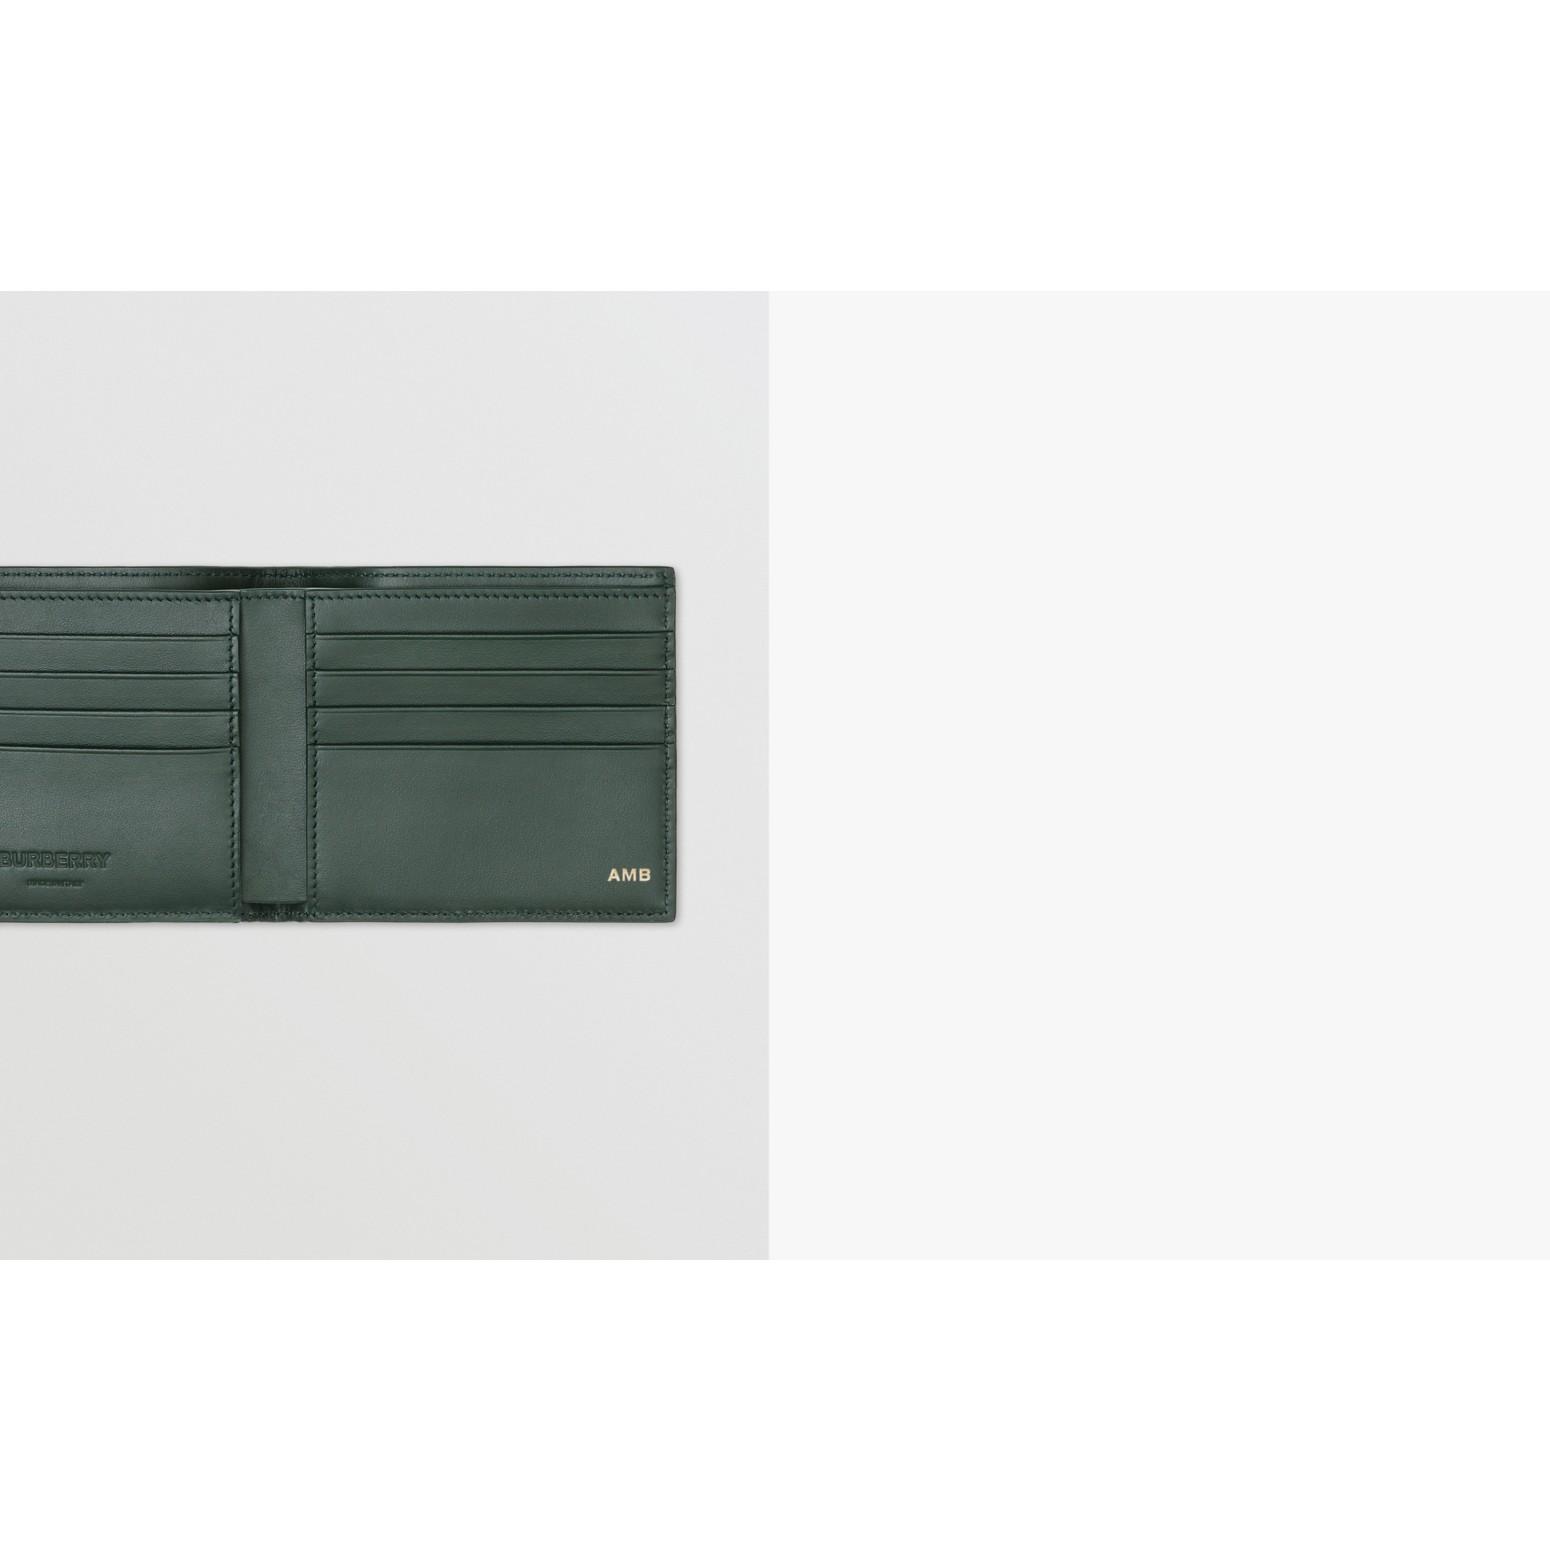 Monogram Leather International Bifold Wallet in Dark Pine Green - Men | Burberry United Kingdom - gallery image 1